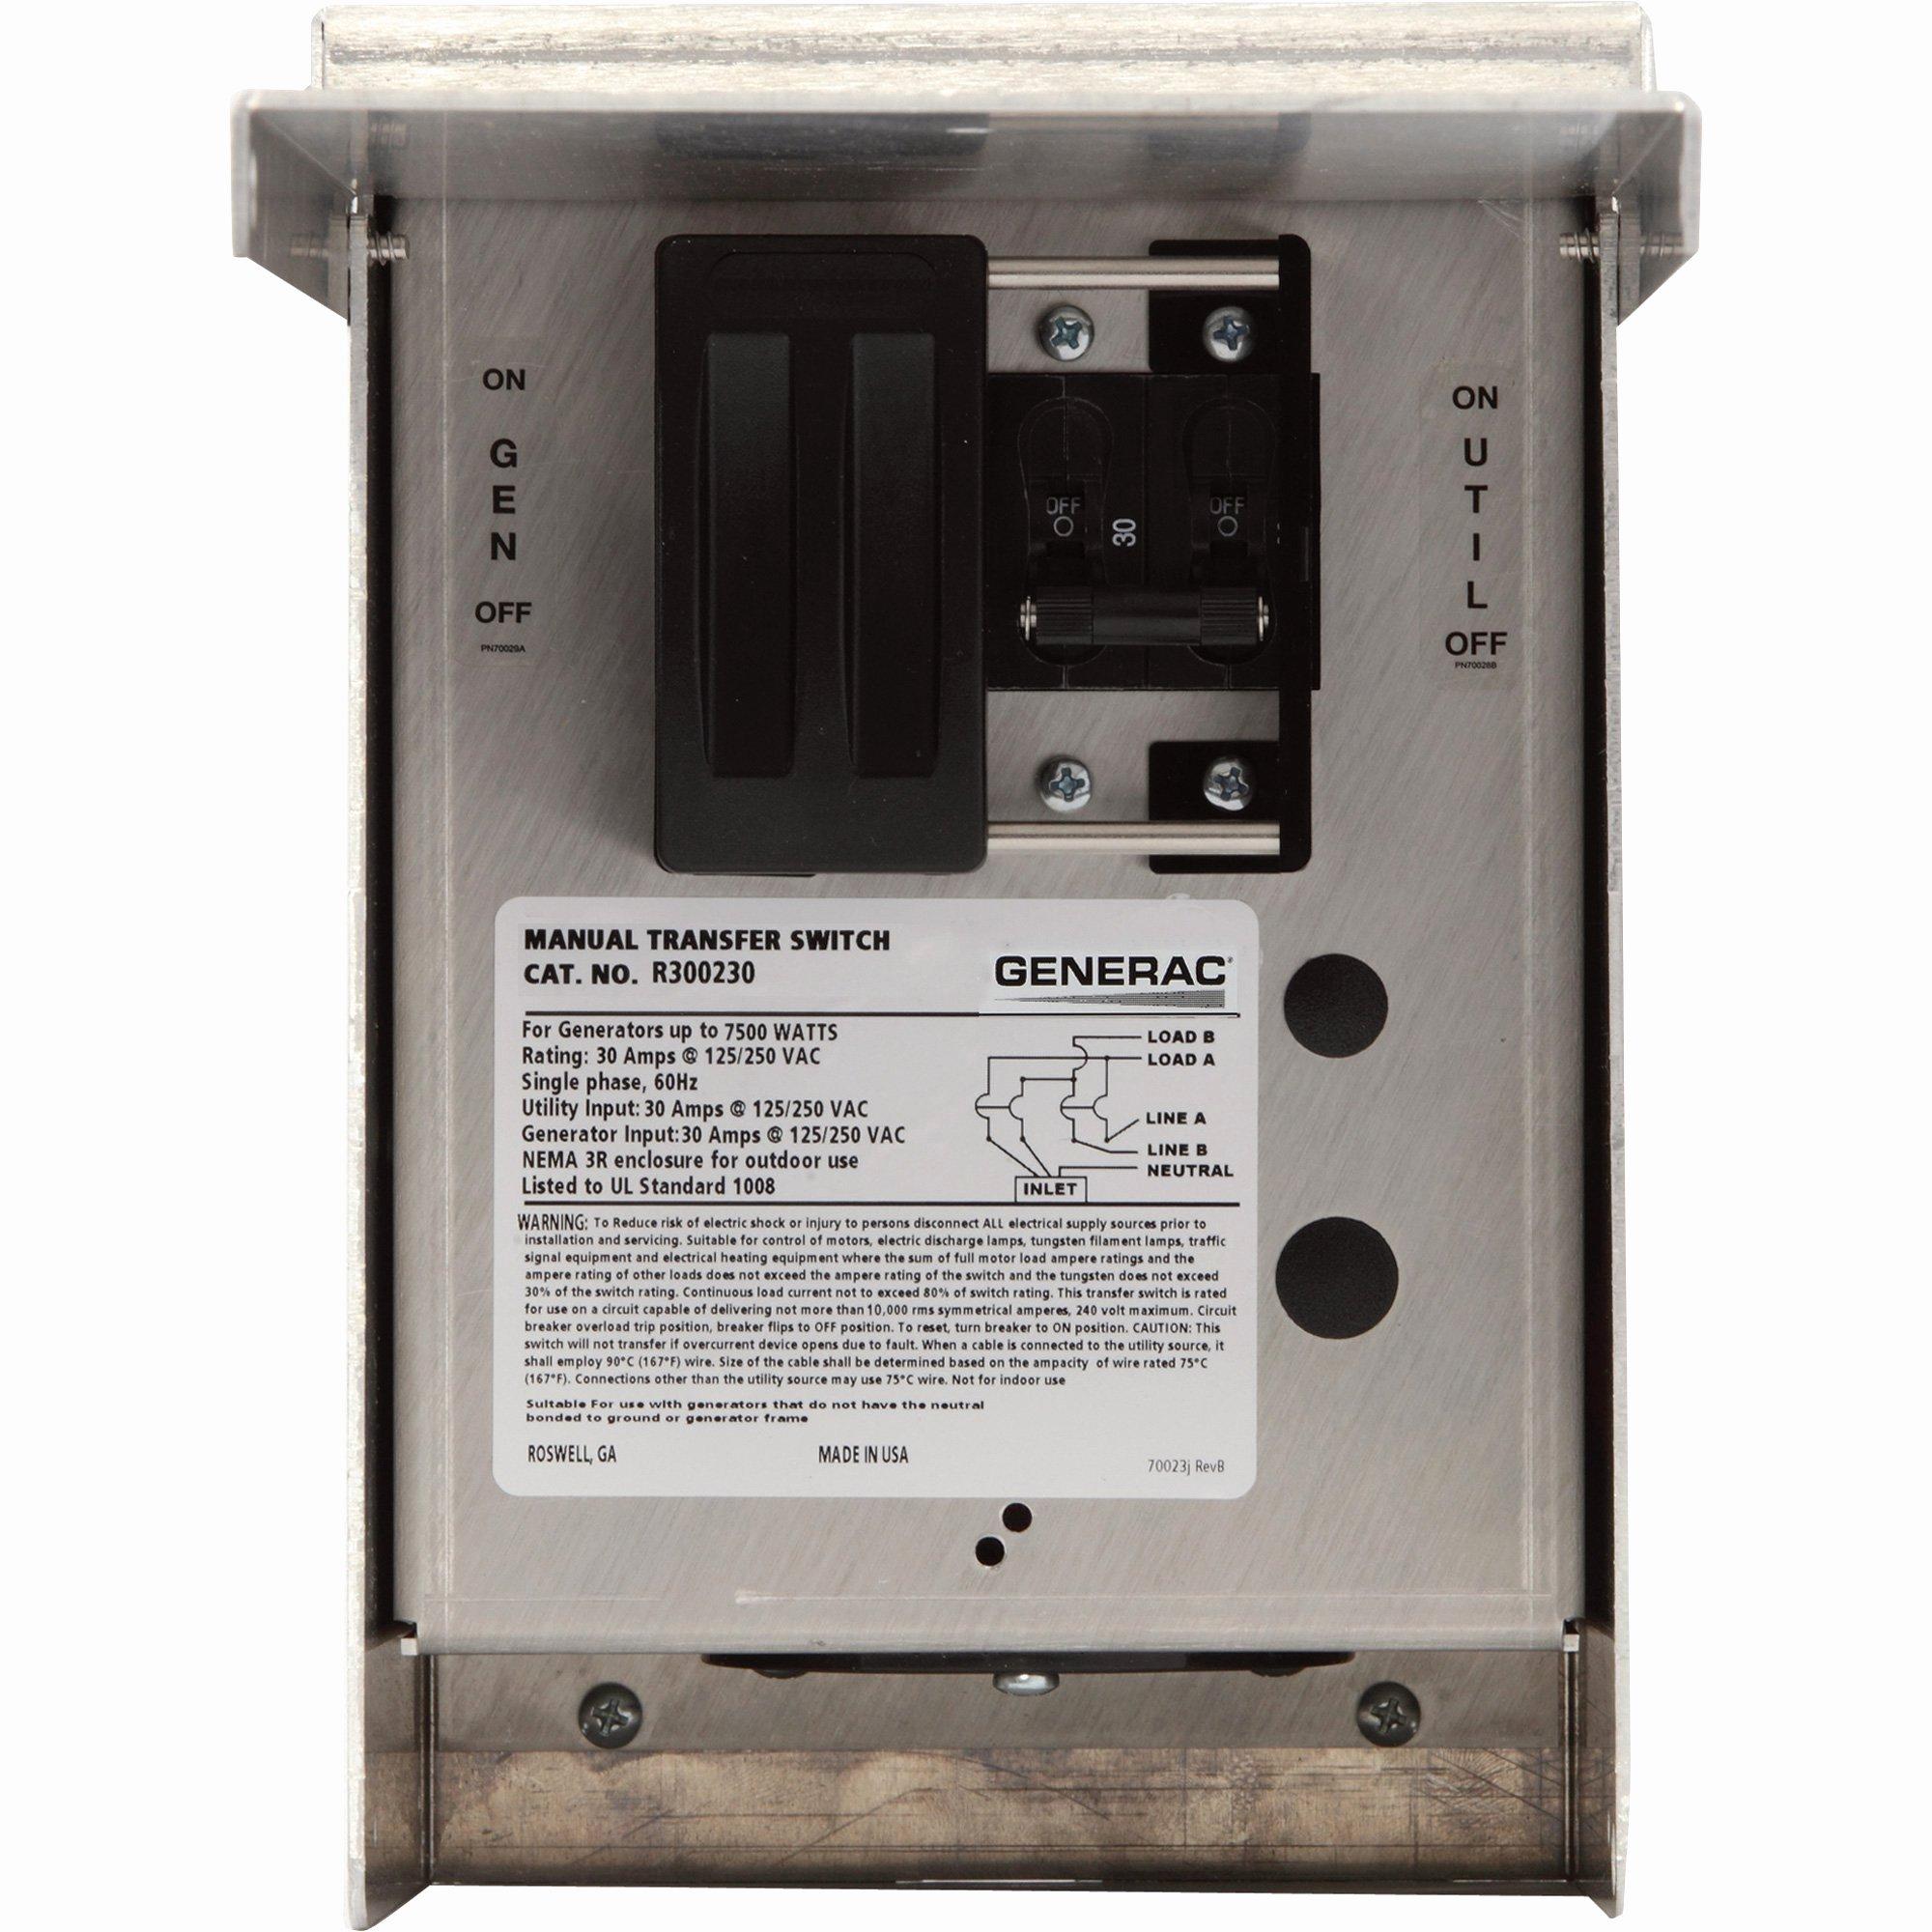 Fake Wire Transfer Generator Elegant Generac Manual Transfer Switch — 30 Amps 125 250 Volts